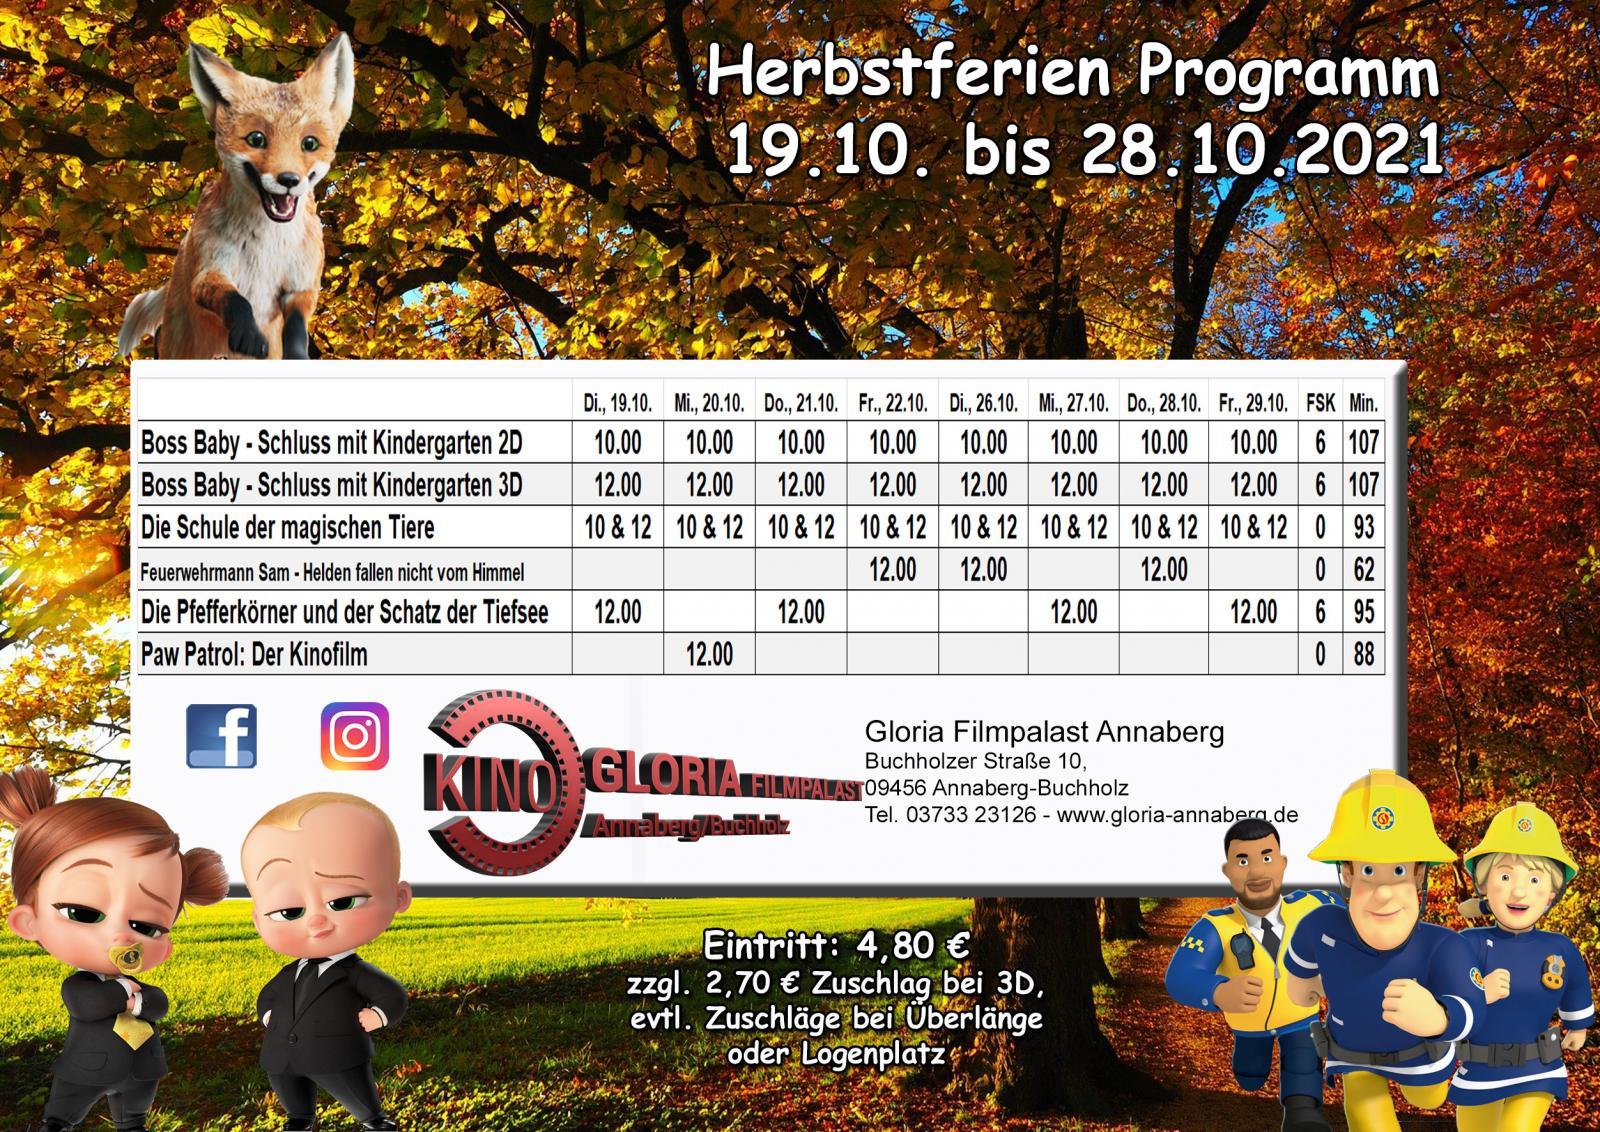 Herbstferienprogramm